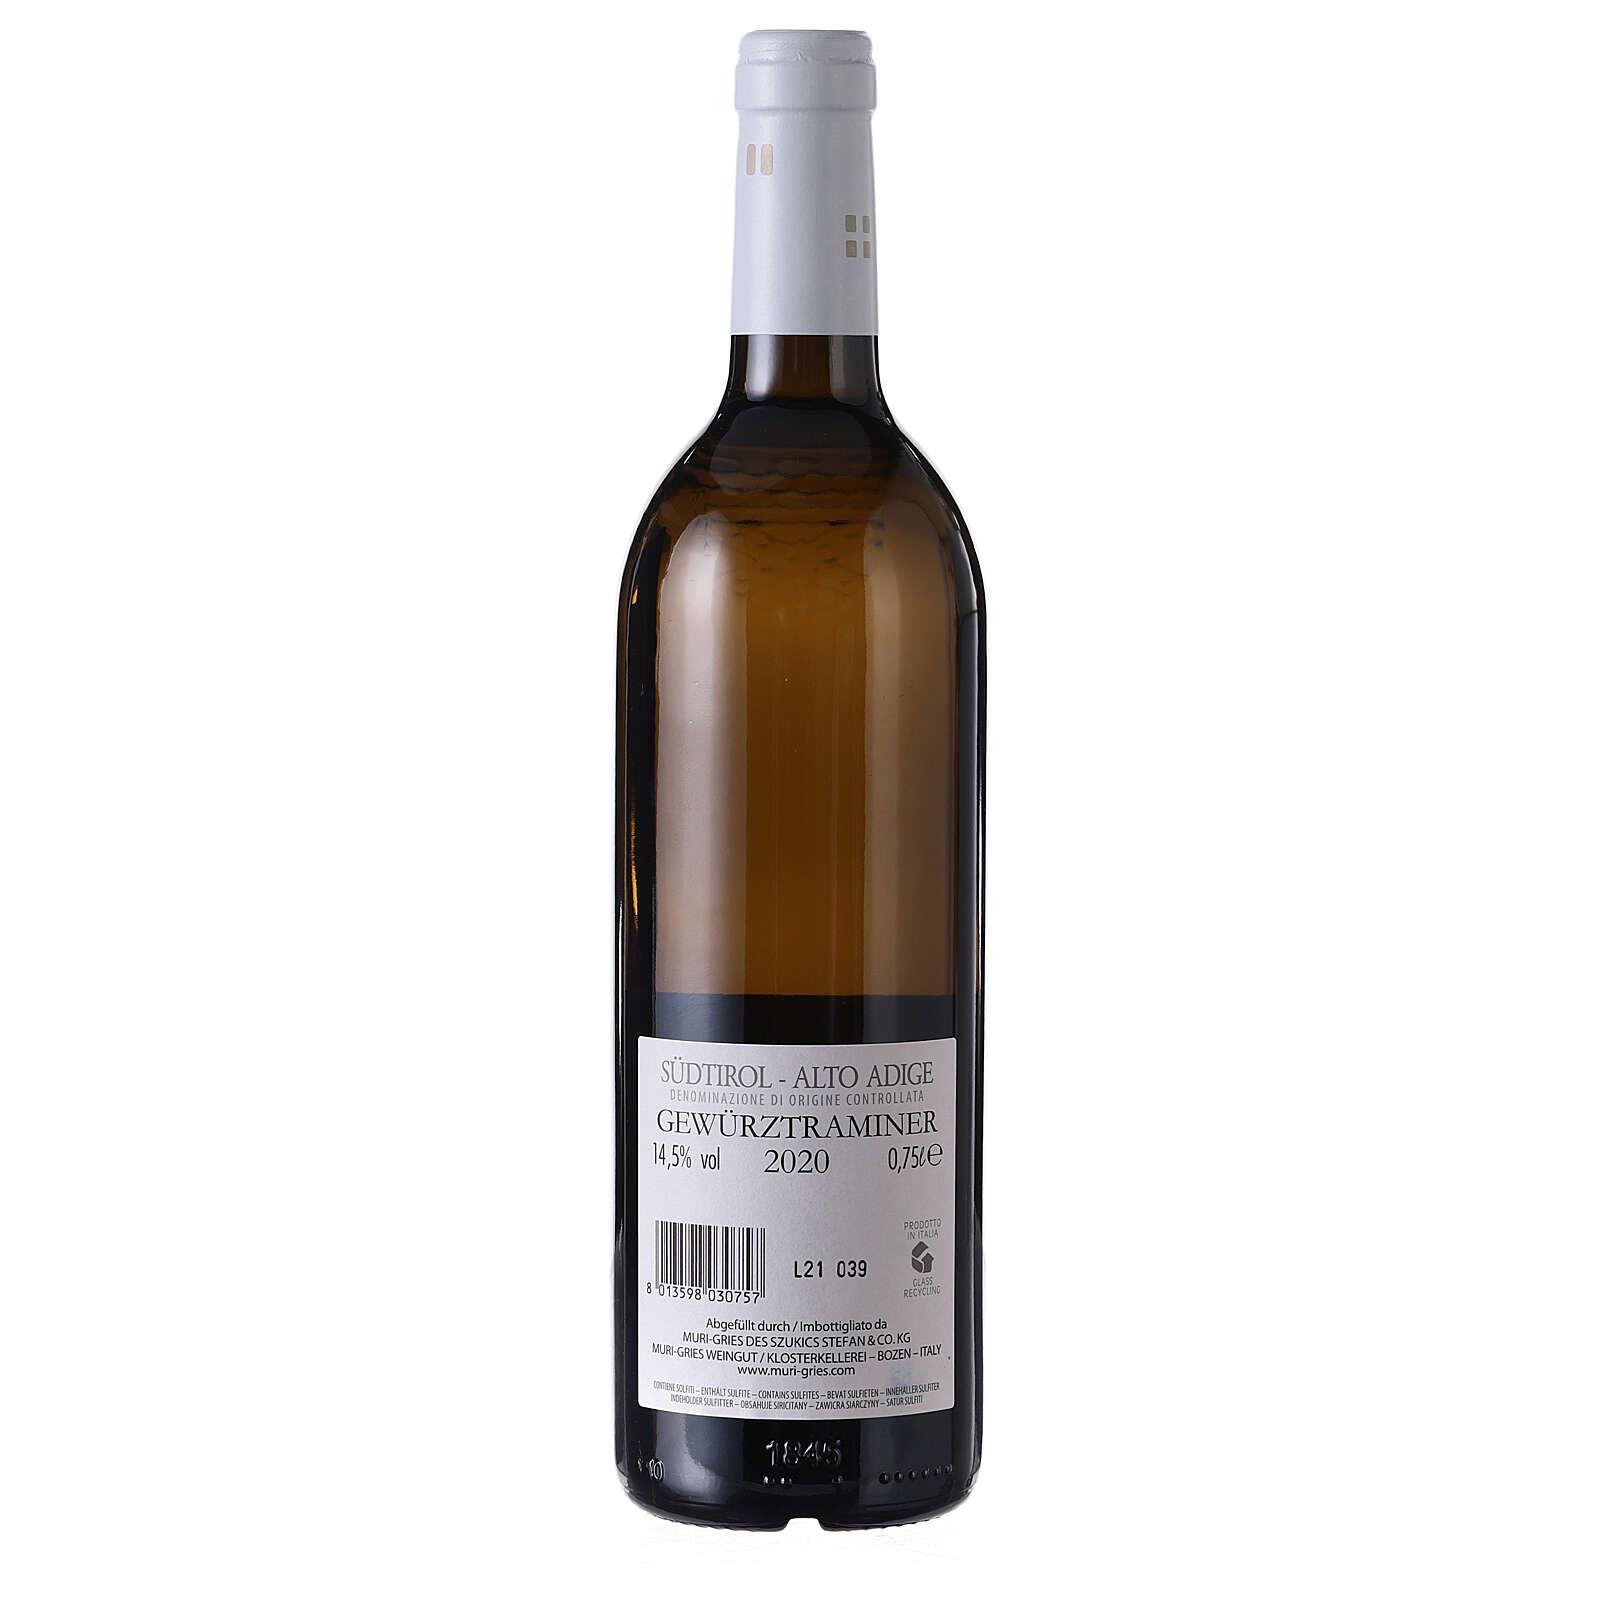 Traminer Aromatico DOC white wine Muri Gries Abbey 2020 3